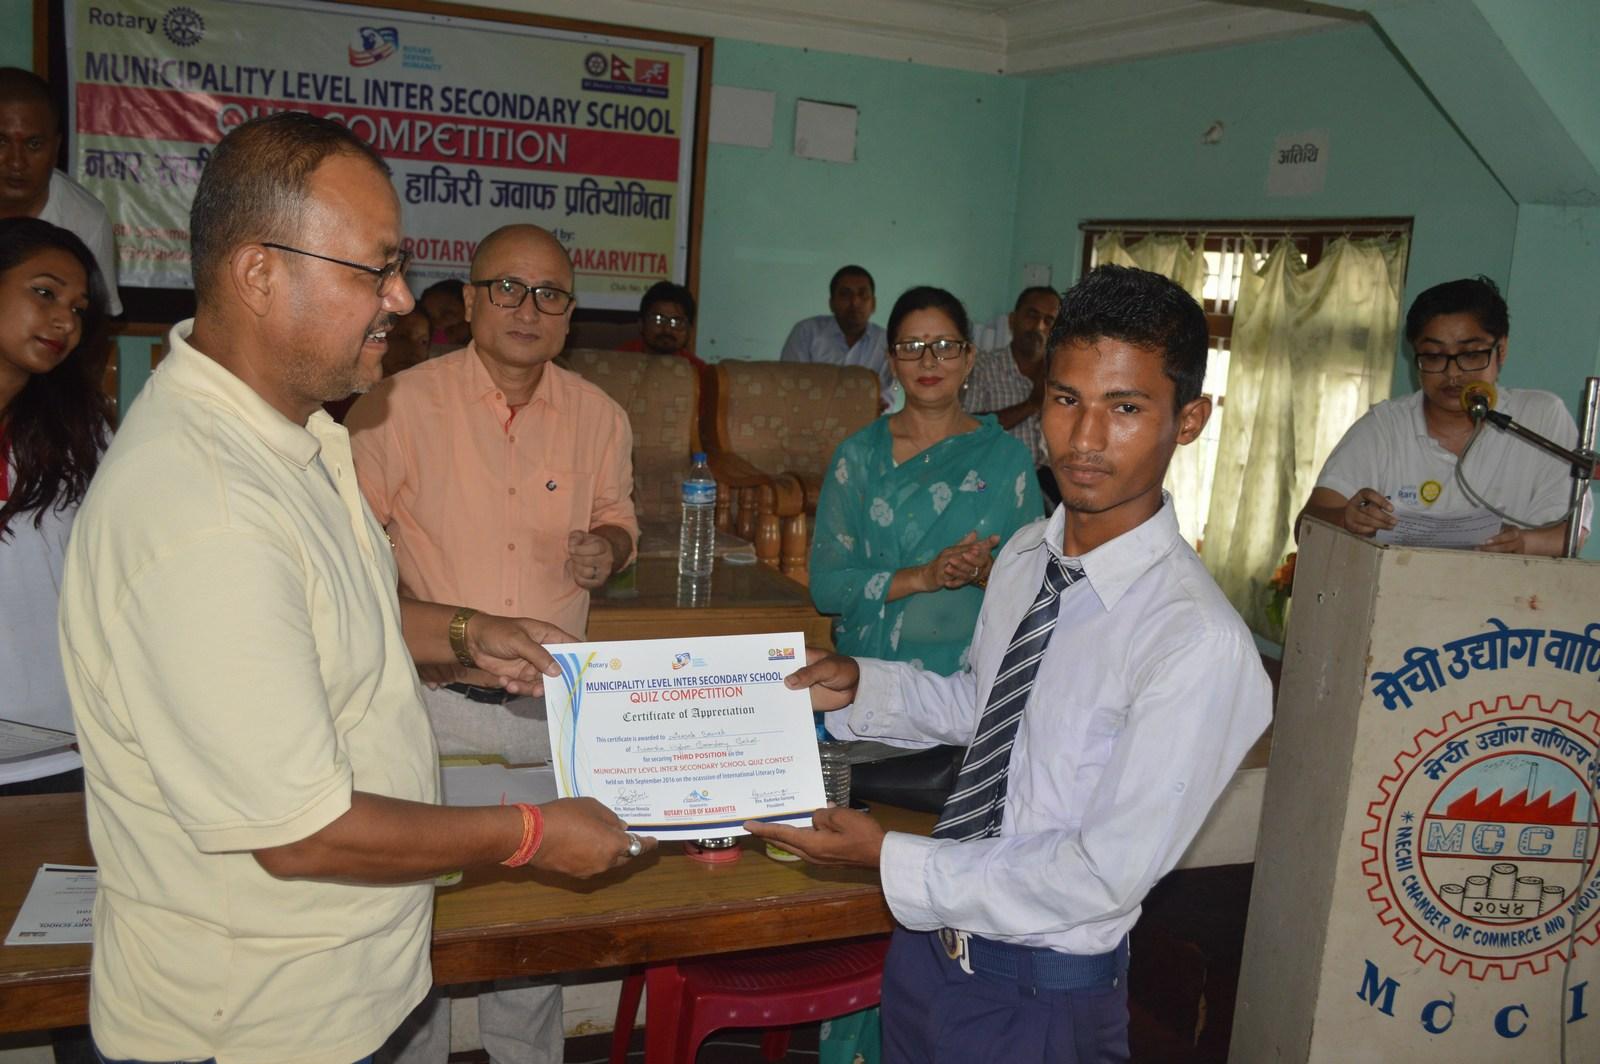 Municipality-Level-Inter-Secondary-School-Quiz-Contest-2016-Rotary-Club-of-Kakarvitta-54